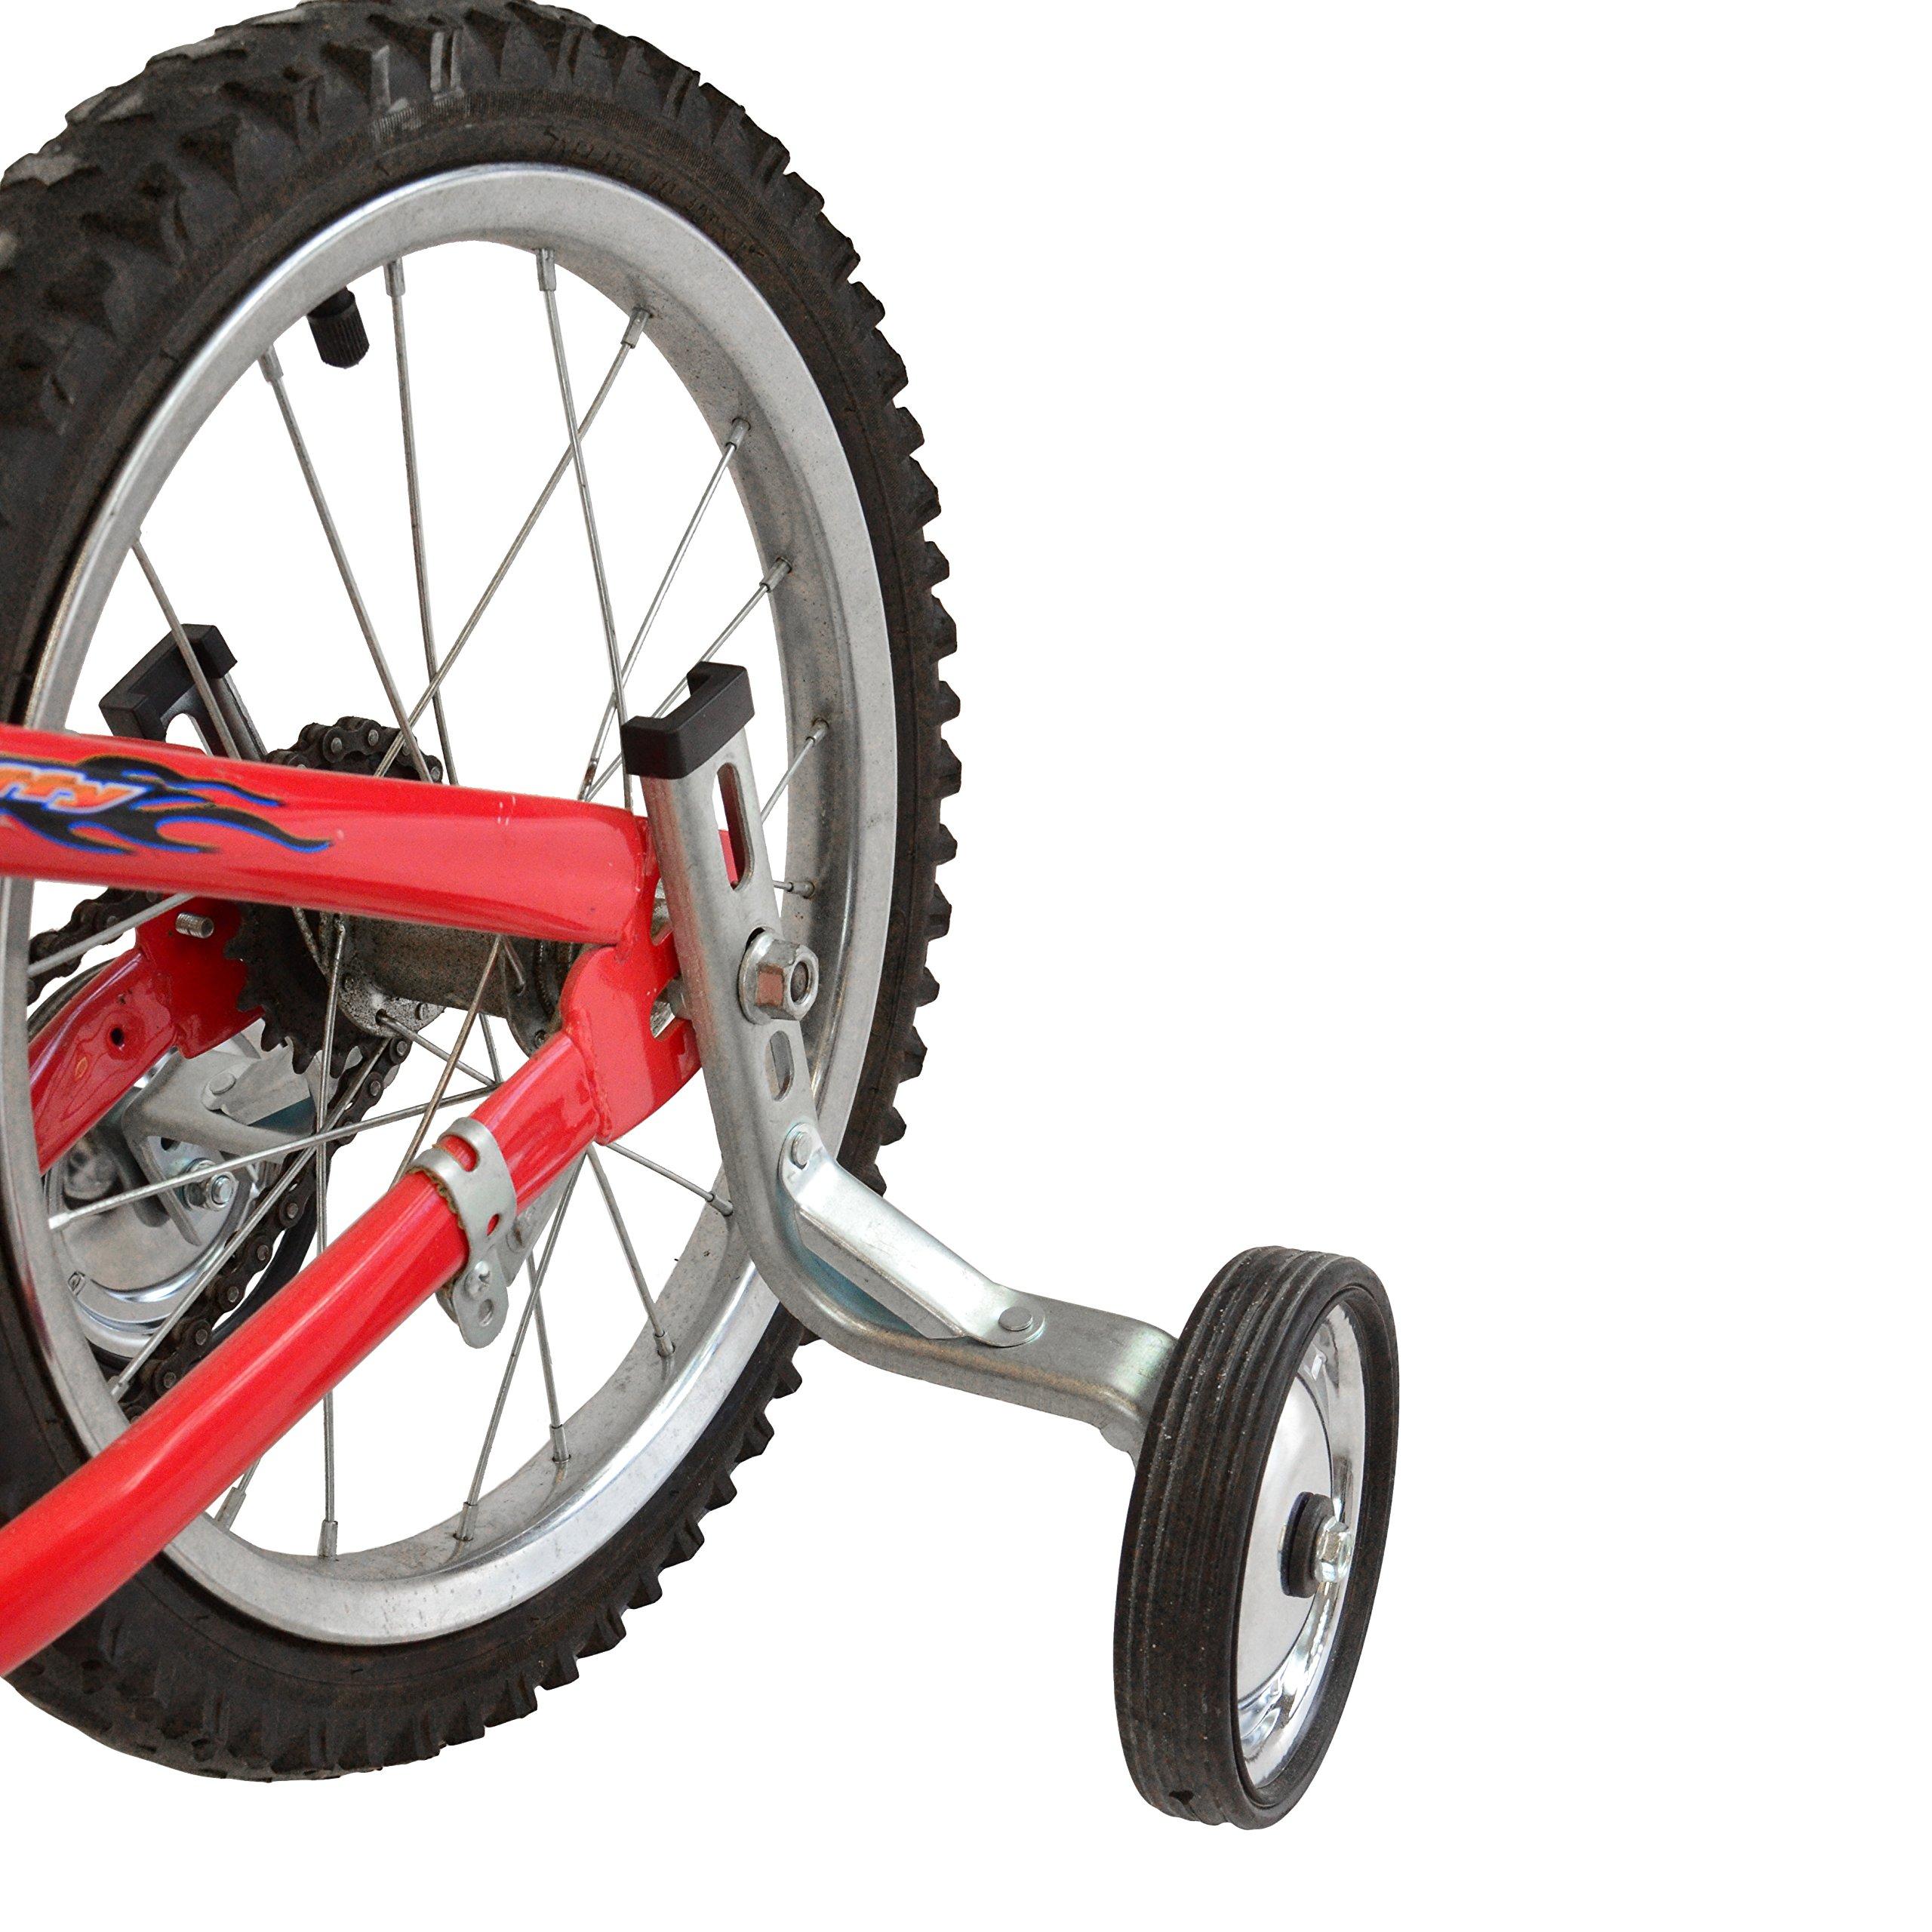 Lumintrail Children's Bicycle Training Wheels 12-18 Inch Kids Bike Stabilizer by Lumintrail (Image #4)